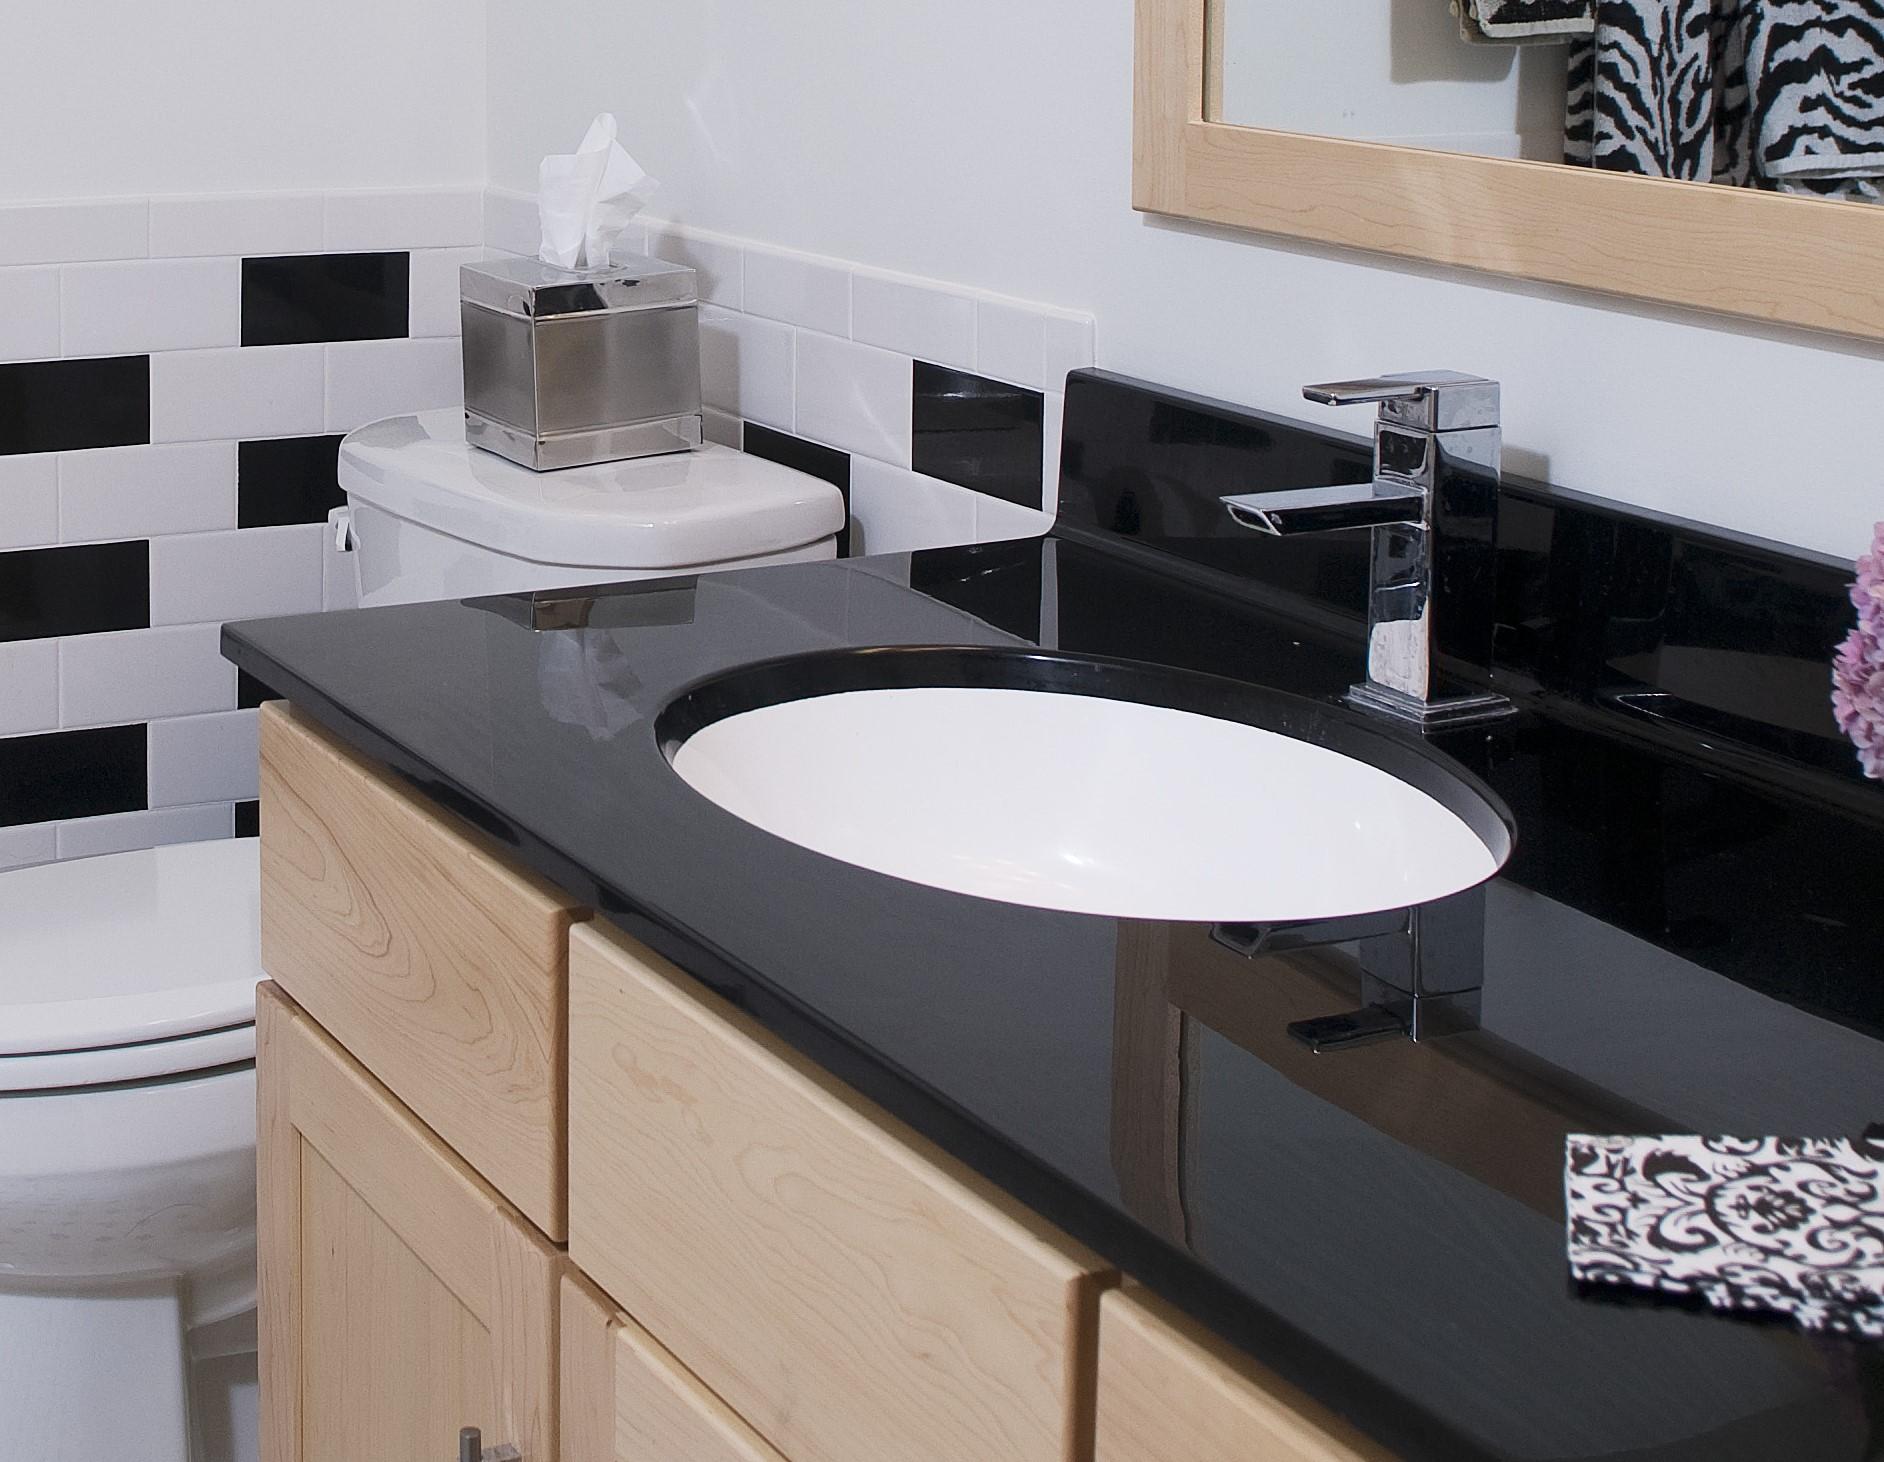 Universal Design for the Bathroom image 2